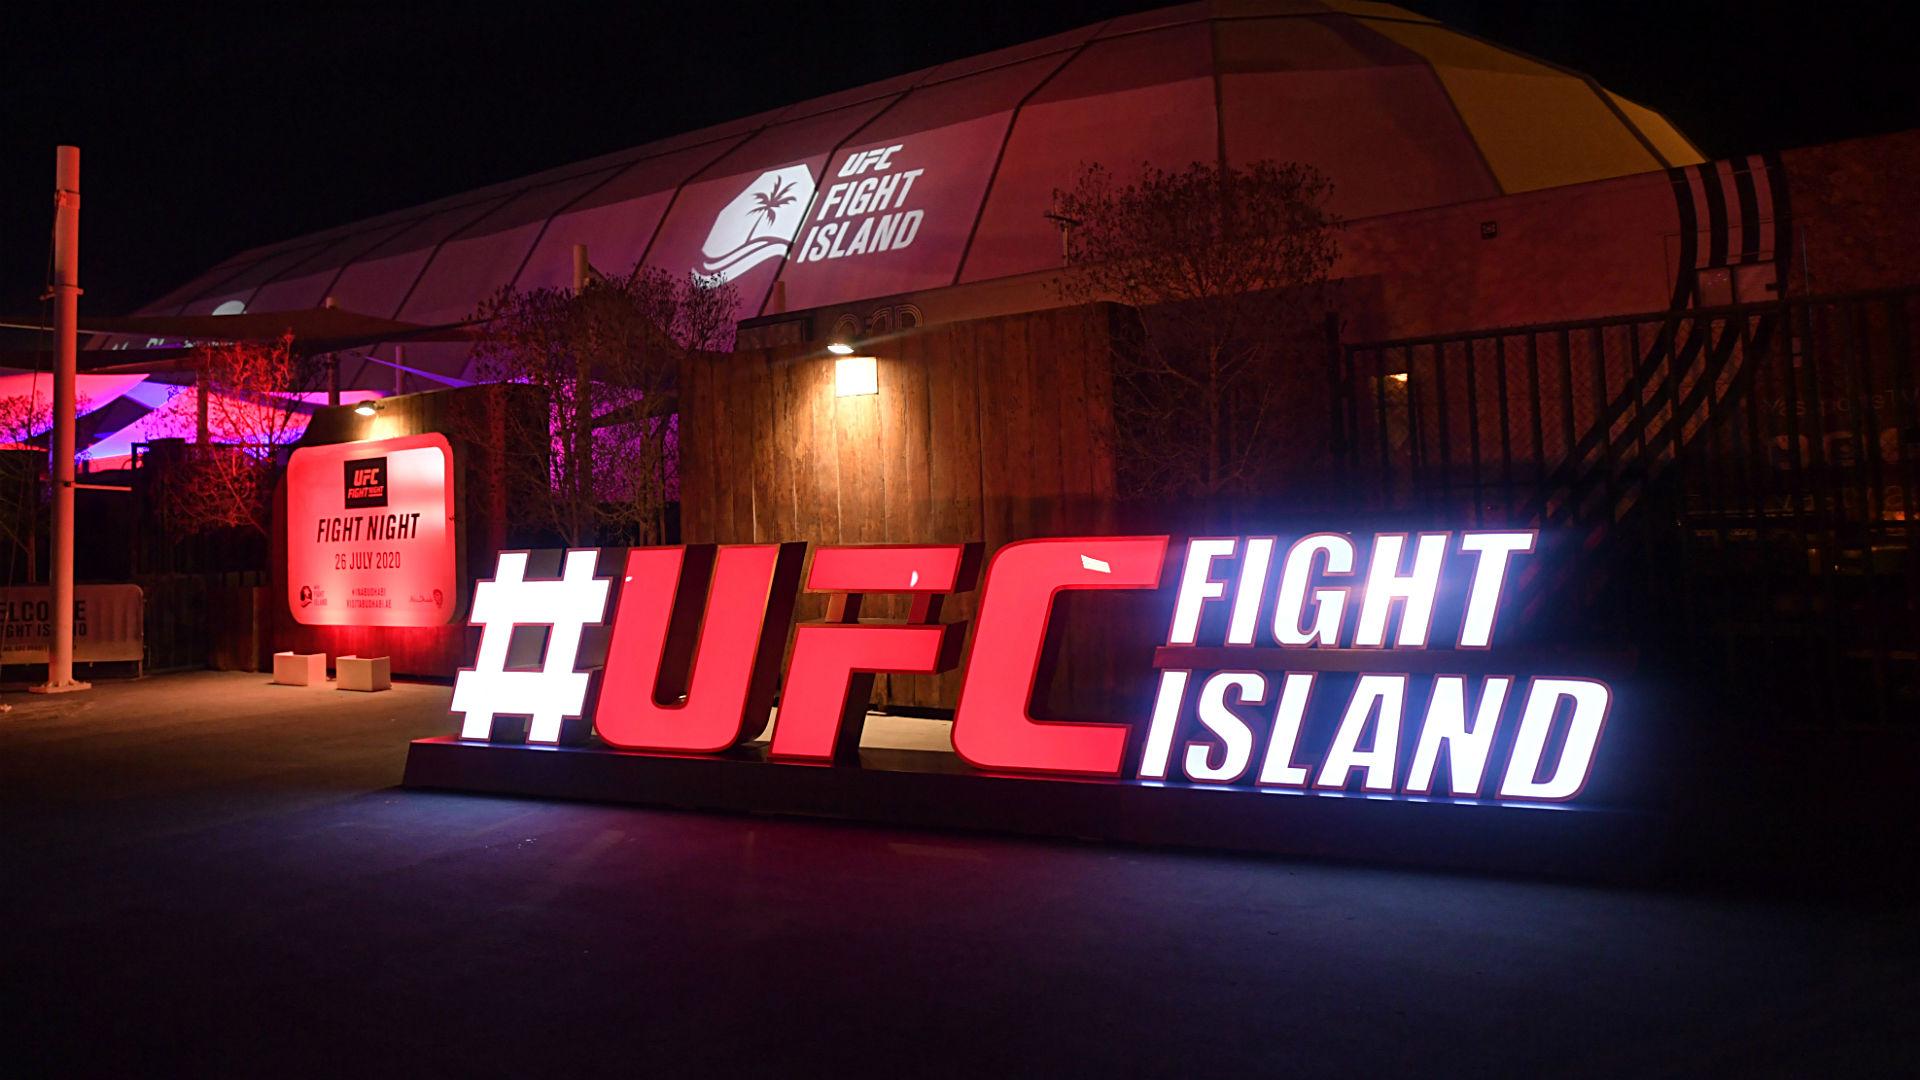 UFC 251 on Fight Island: Usman vs. Masvidal results, highlights from Abu Dhabi card 1